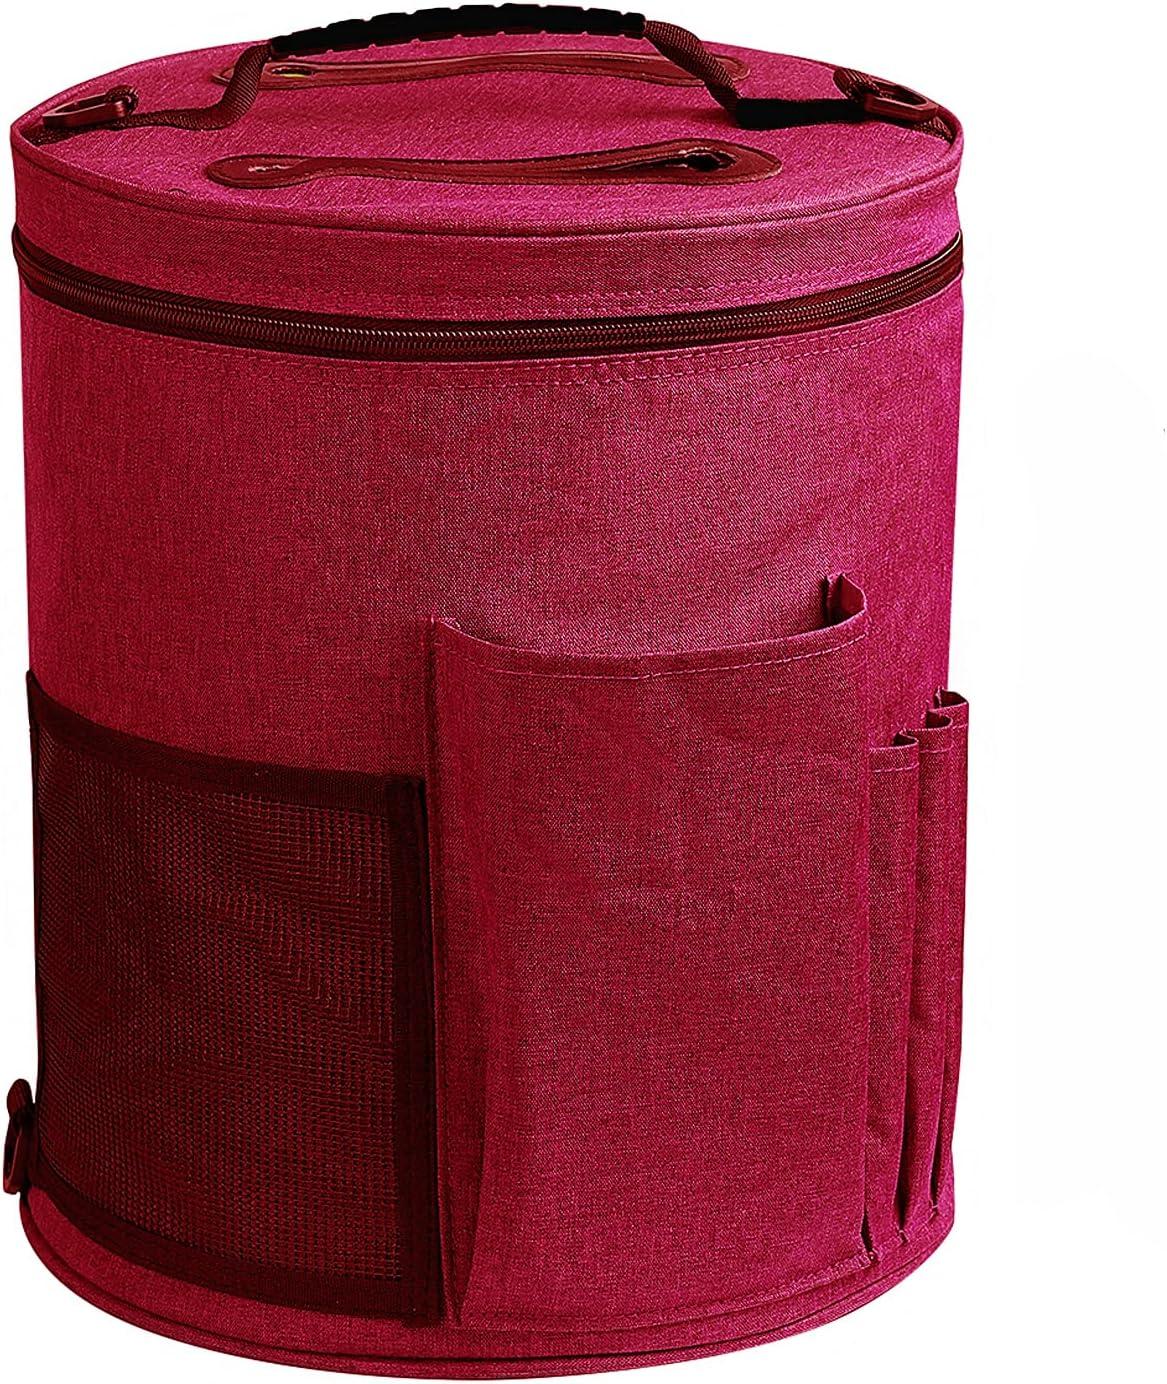 Max 60% OFF Weabetfu Large Capacity Portable Yarn St Save money Knitting Tote Organizer